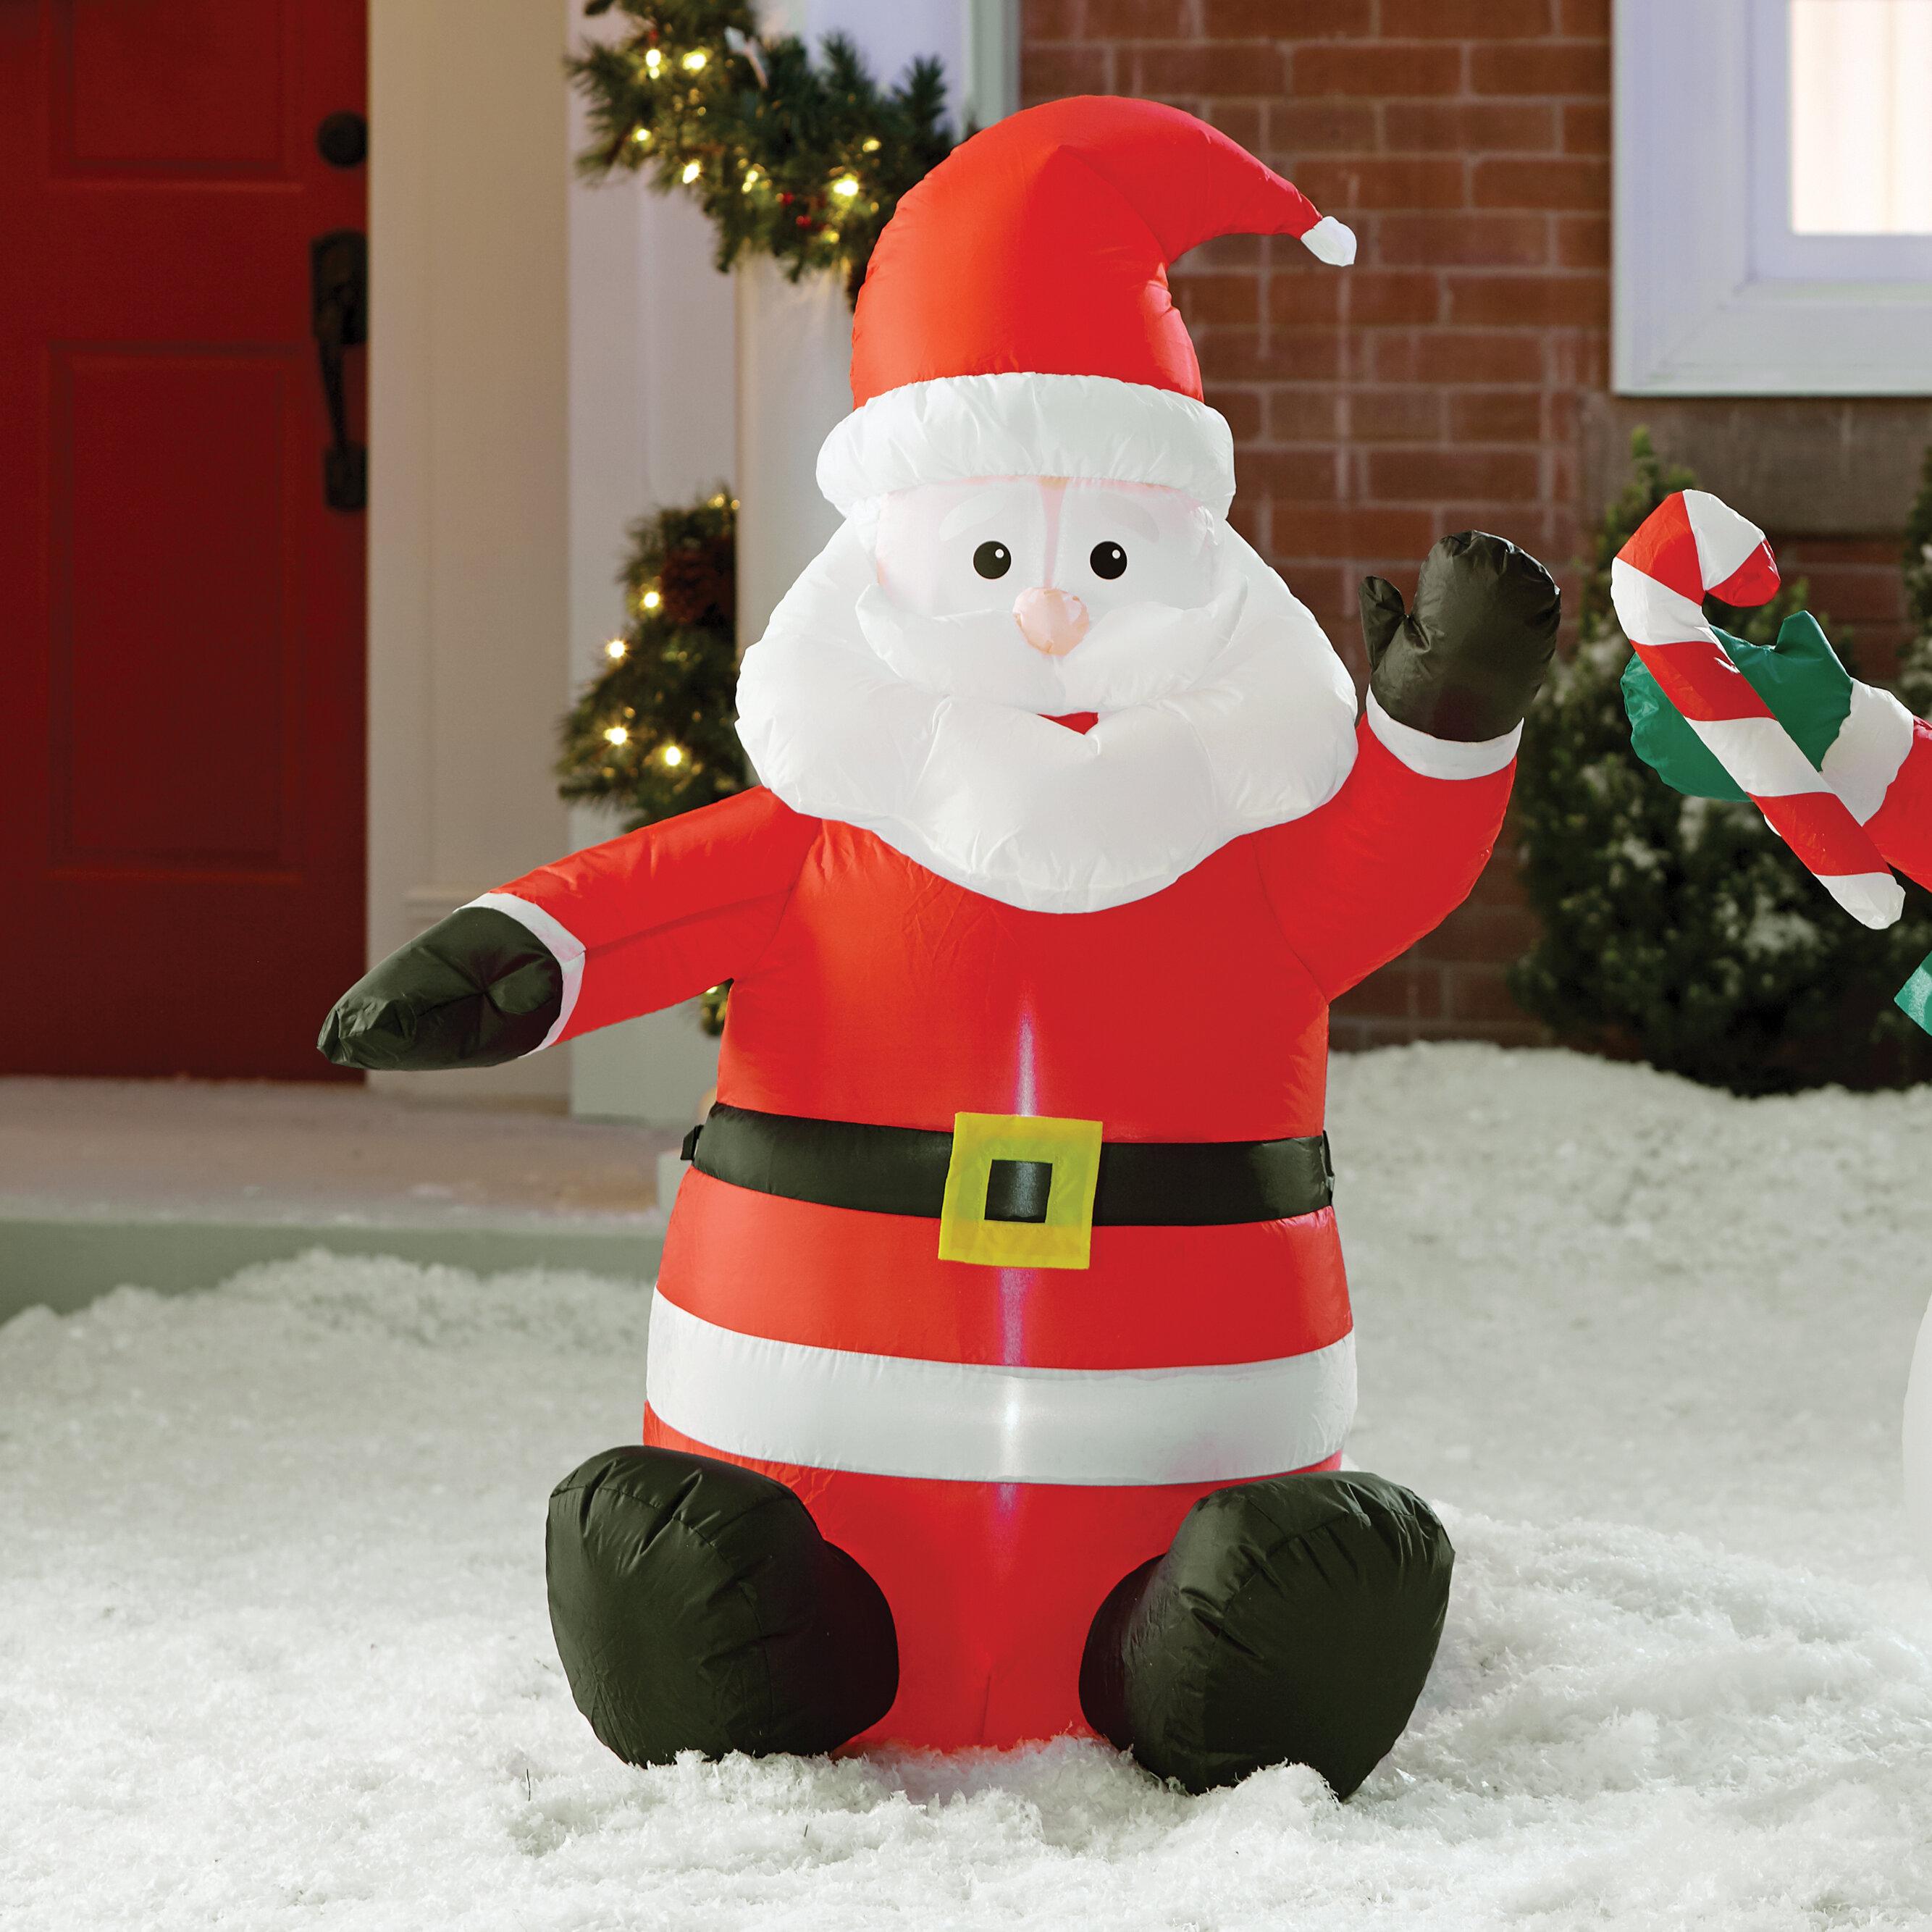 Charmant The Holiday Aisle Inflatable Santa Claus Decoration U0026 Reviews | Wayfair